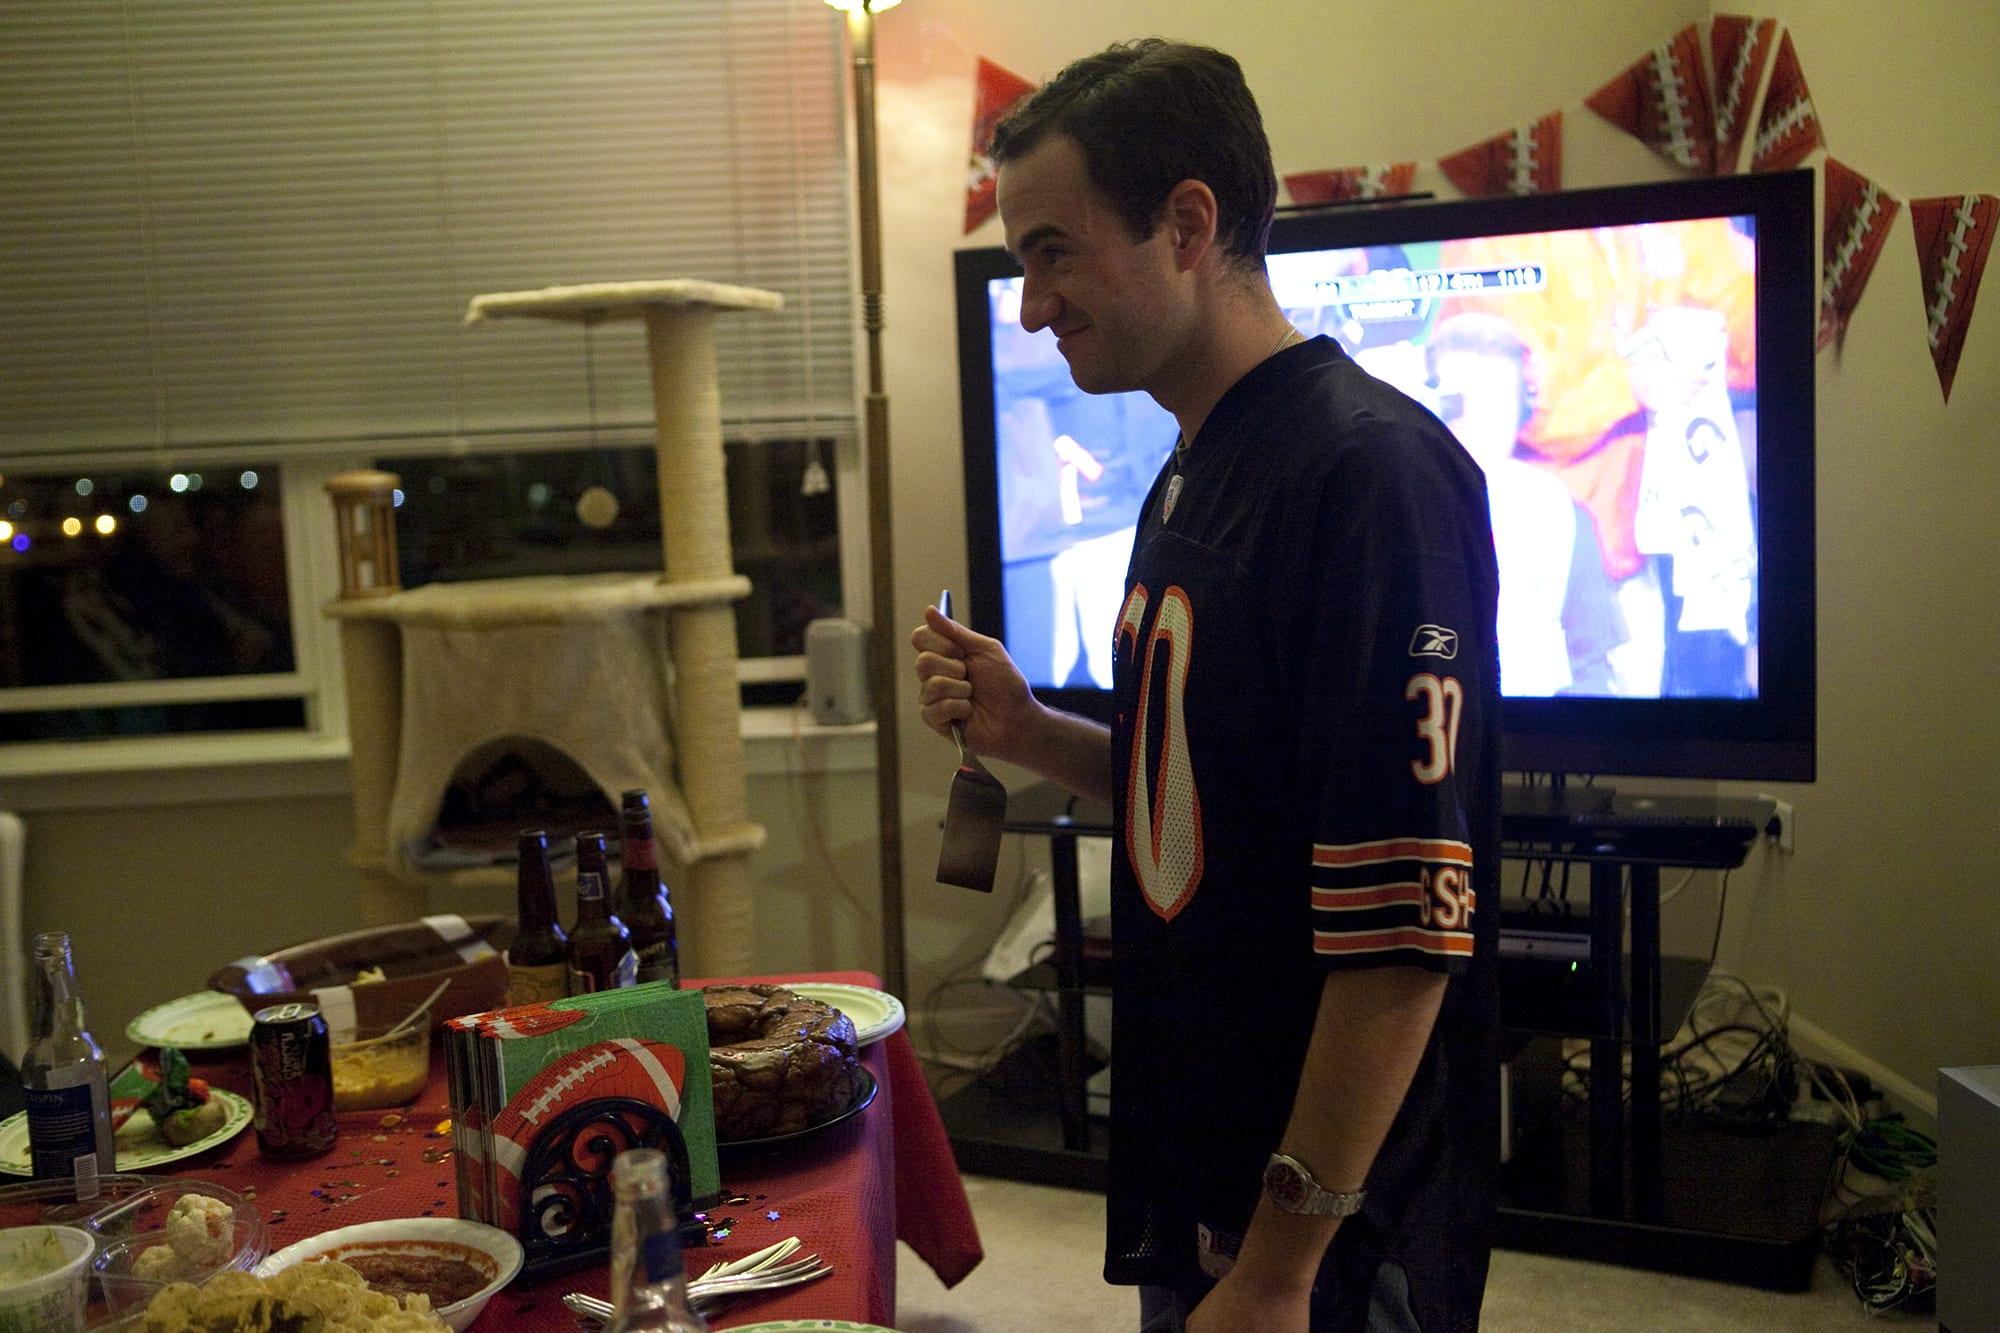 Super Bowl/Puppy Bowl Party